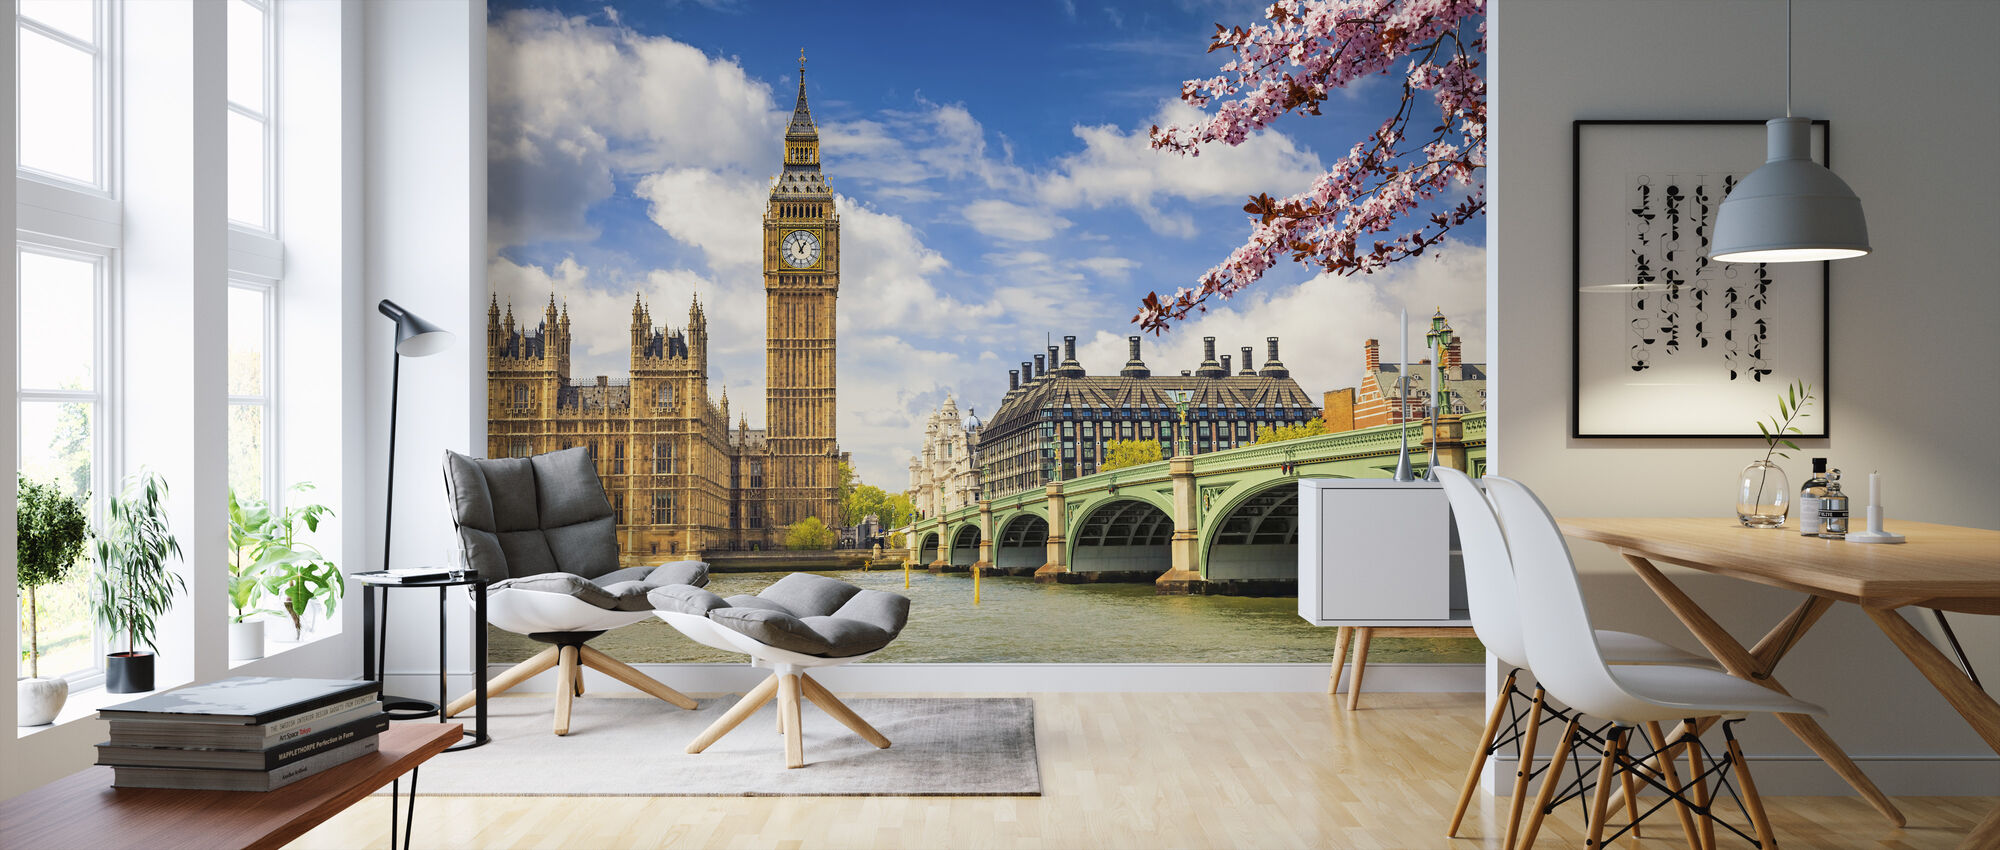 Big Ben - Wallpaper - Living Room